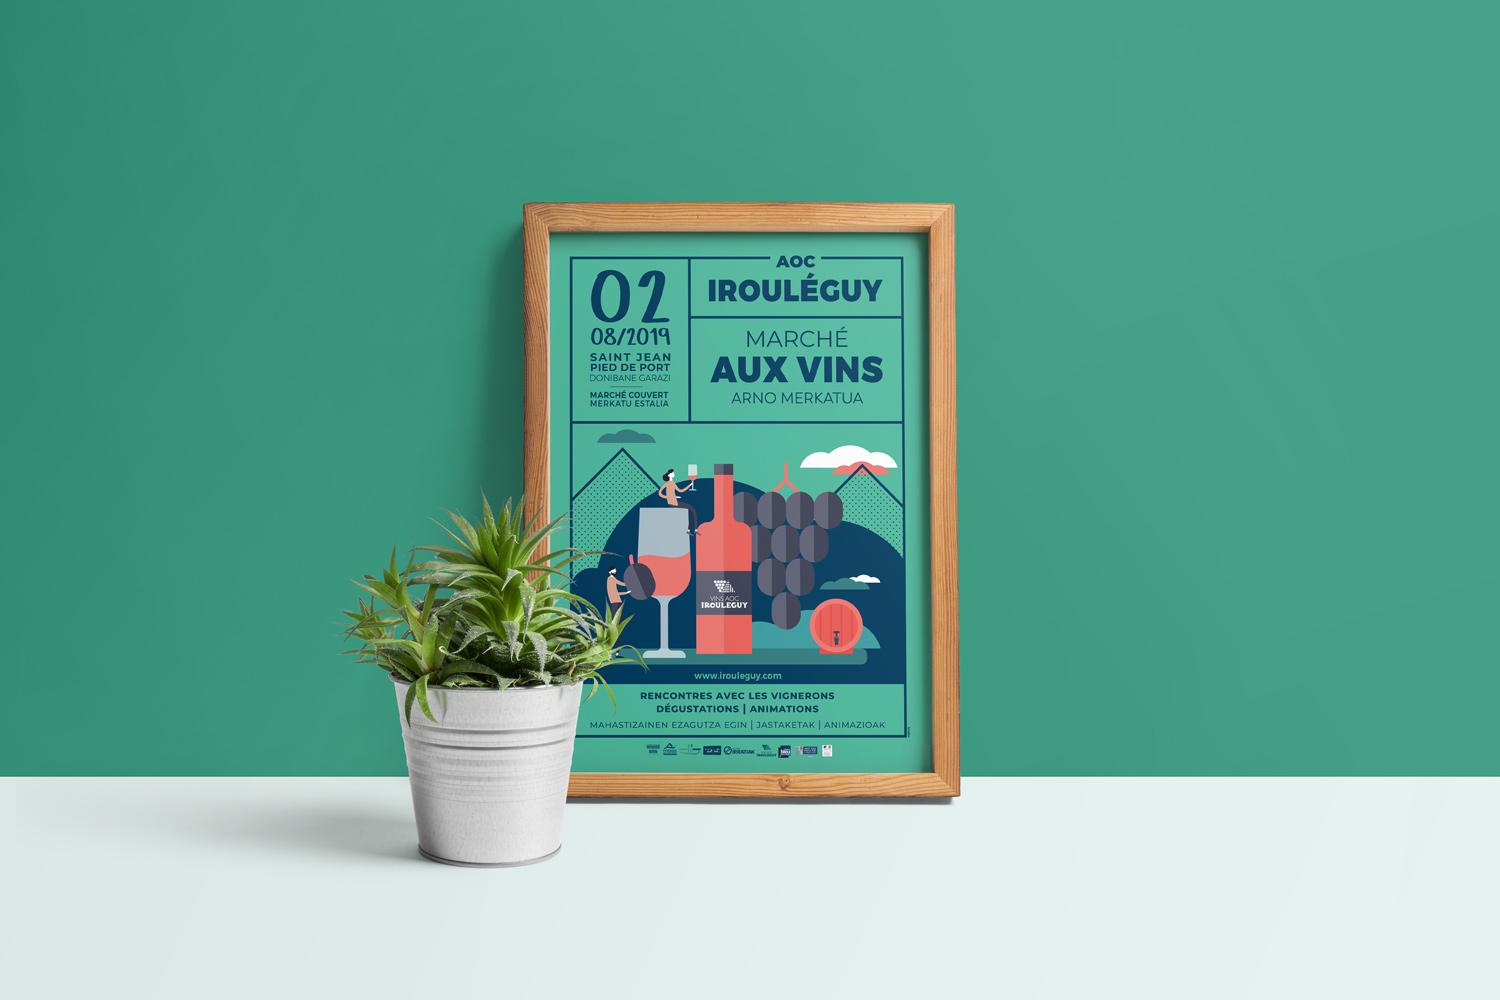 syndicat-vins-irouleguy-bixoko-affiche-01